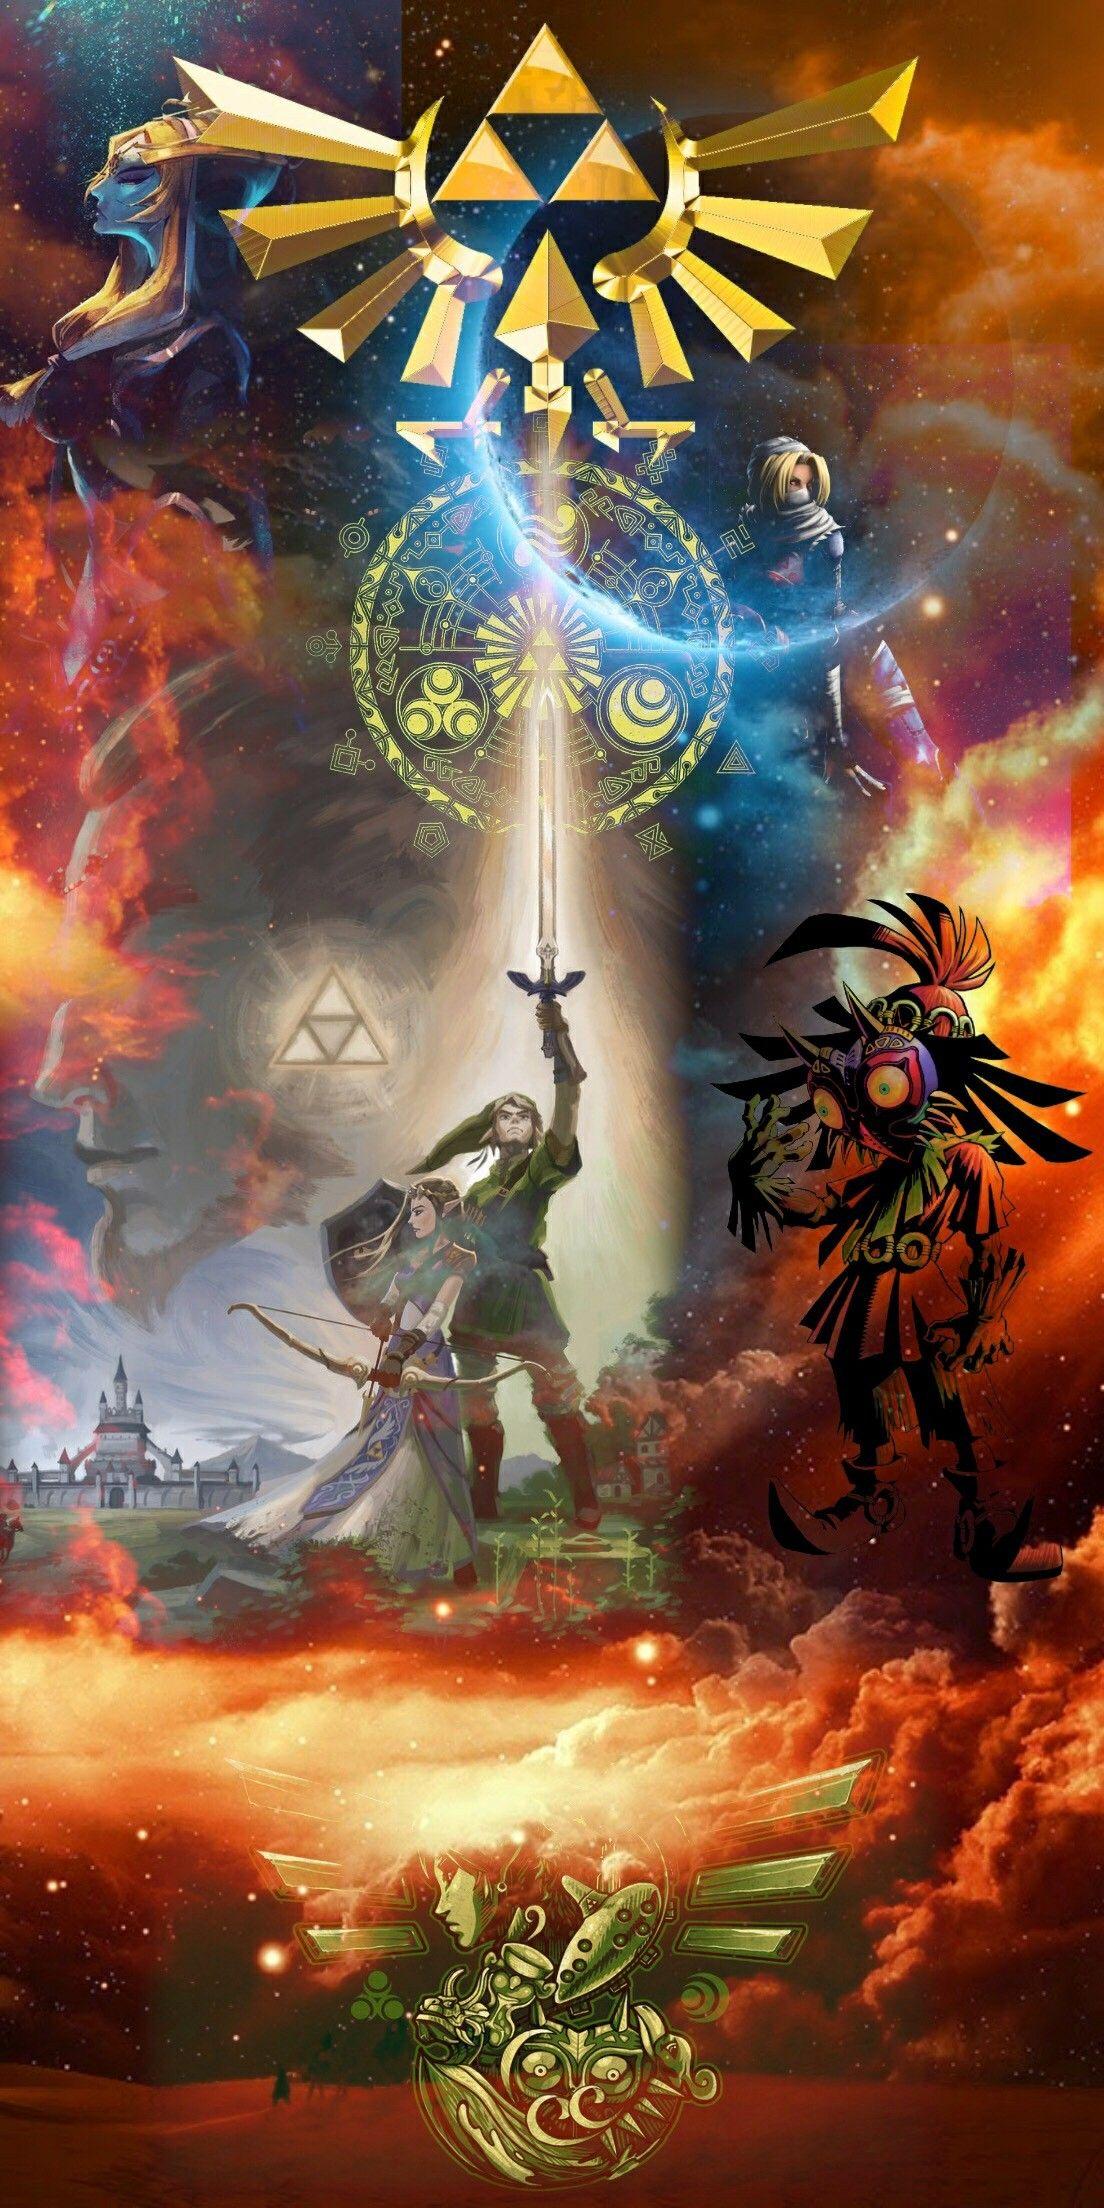 Pin De Kerry Moore En The Legend Of Zelda Videojuegos Wallpaper Personajes De Videojuegos Imagenes De Zelda